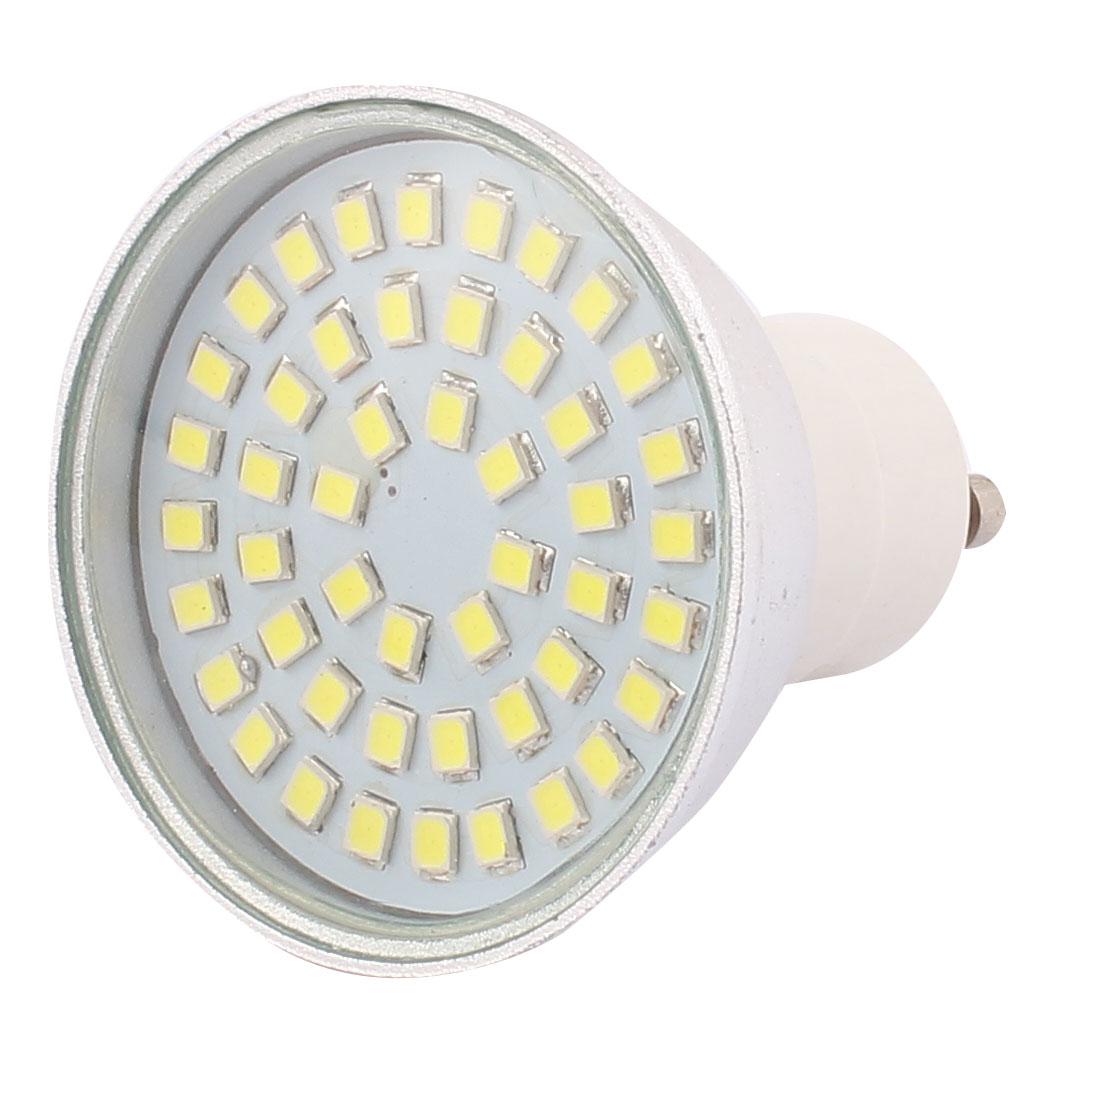 220V GU10 LED Light 4W 2835 SMD 48 LEDs Spotlight Down Lamp Energy Save Pure White